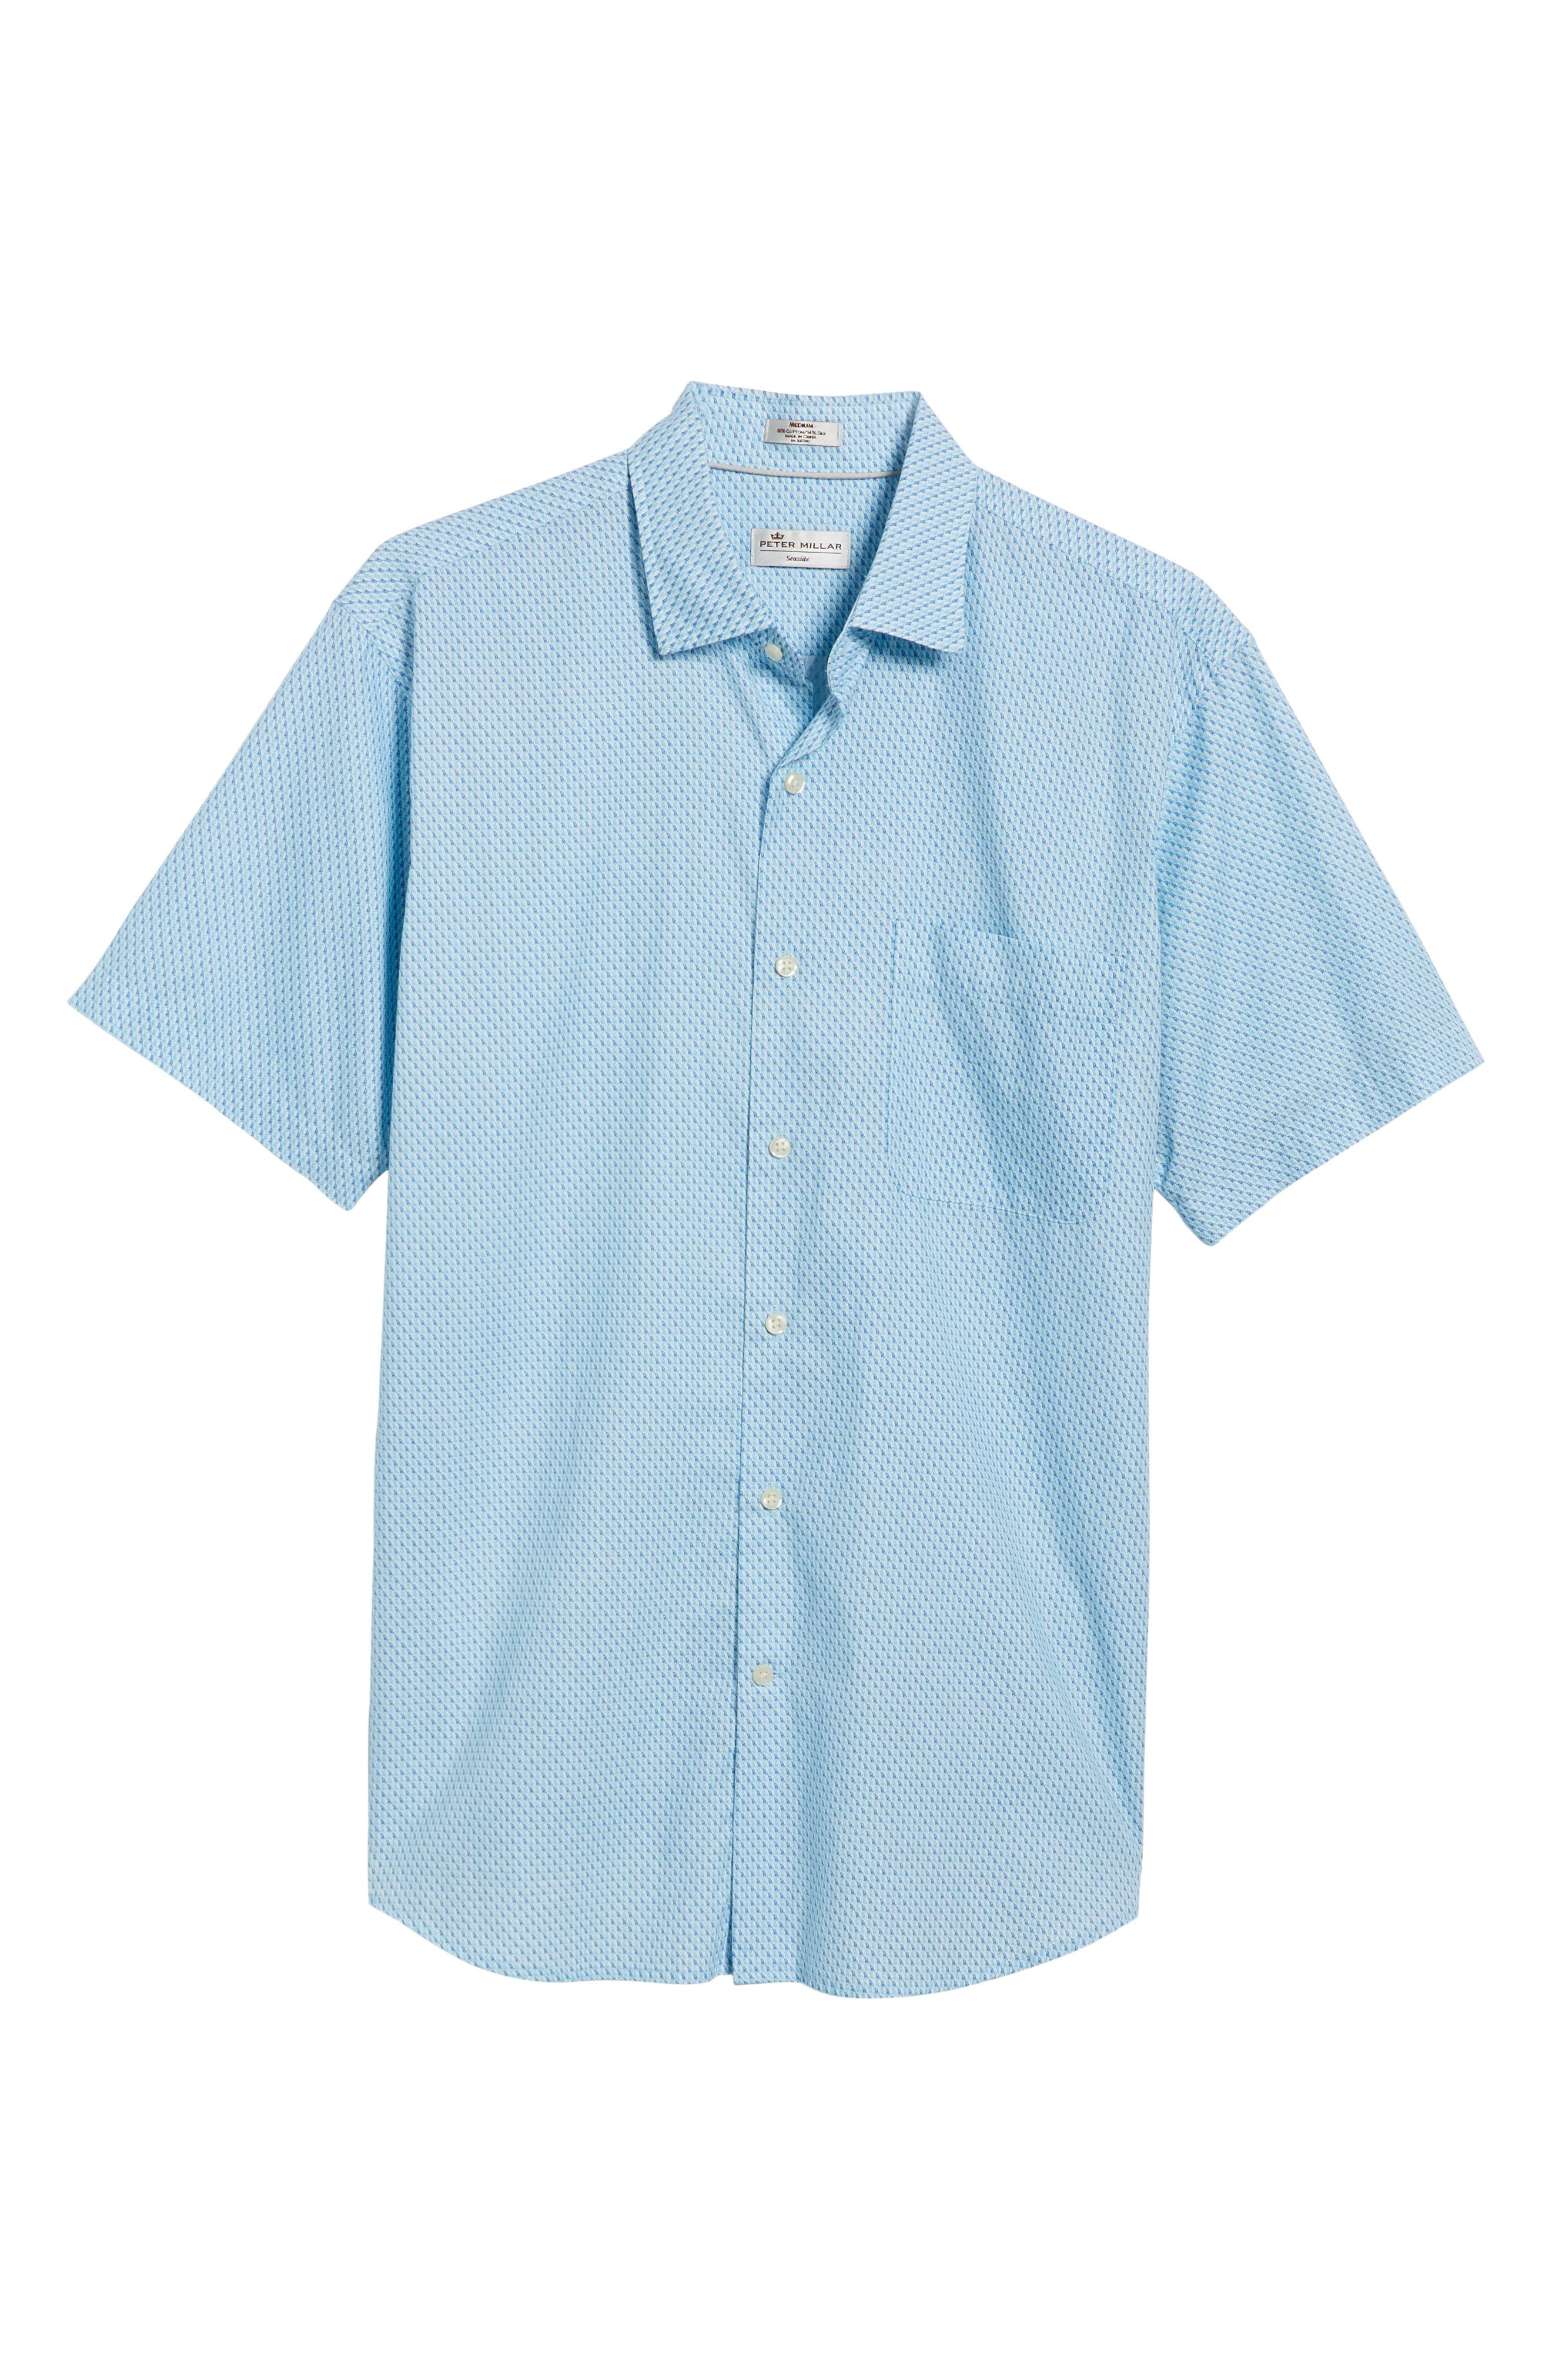 Sail Away Regular Fit Cotton & Silk Sport Shirt,                             Alternate thumbnail 6, color,                             407